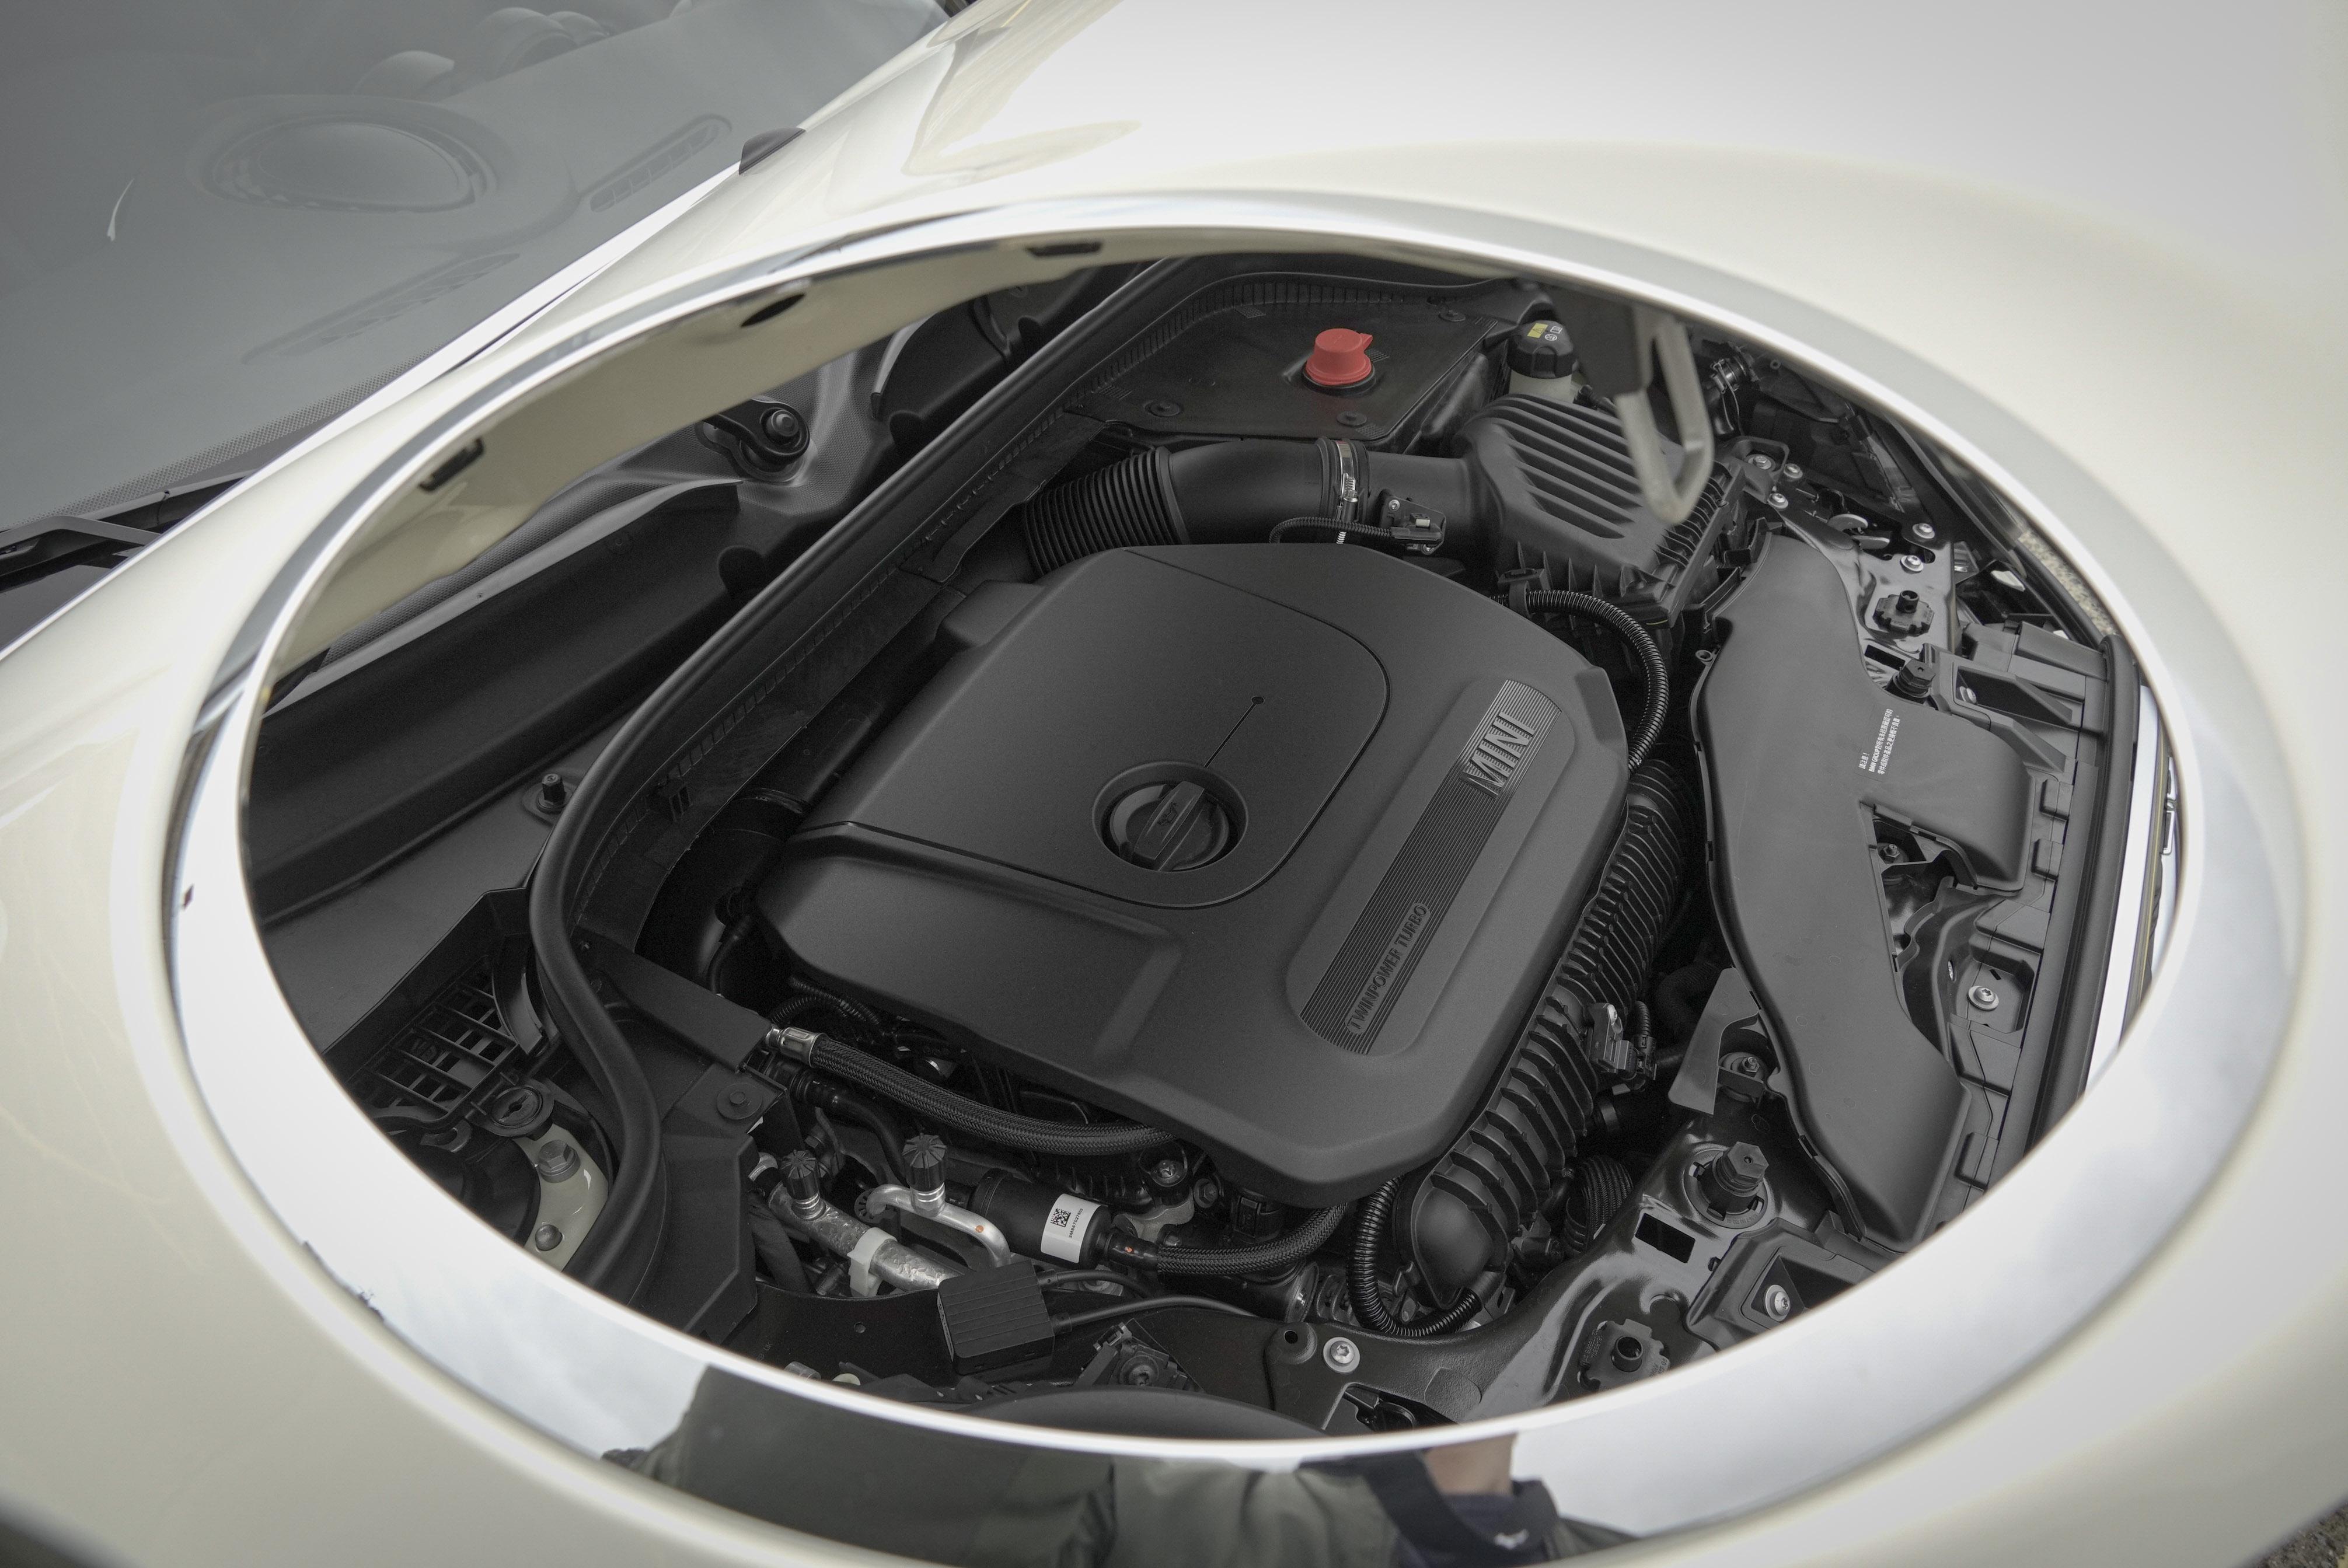 Cooper S 的 2.0 升 TwinPower Turbo 四缸渦輪引擎可帶來 192 匹馬力、280 Nm 扭力,0-100 km/h 加速可於 6.8 秒內完成。